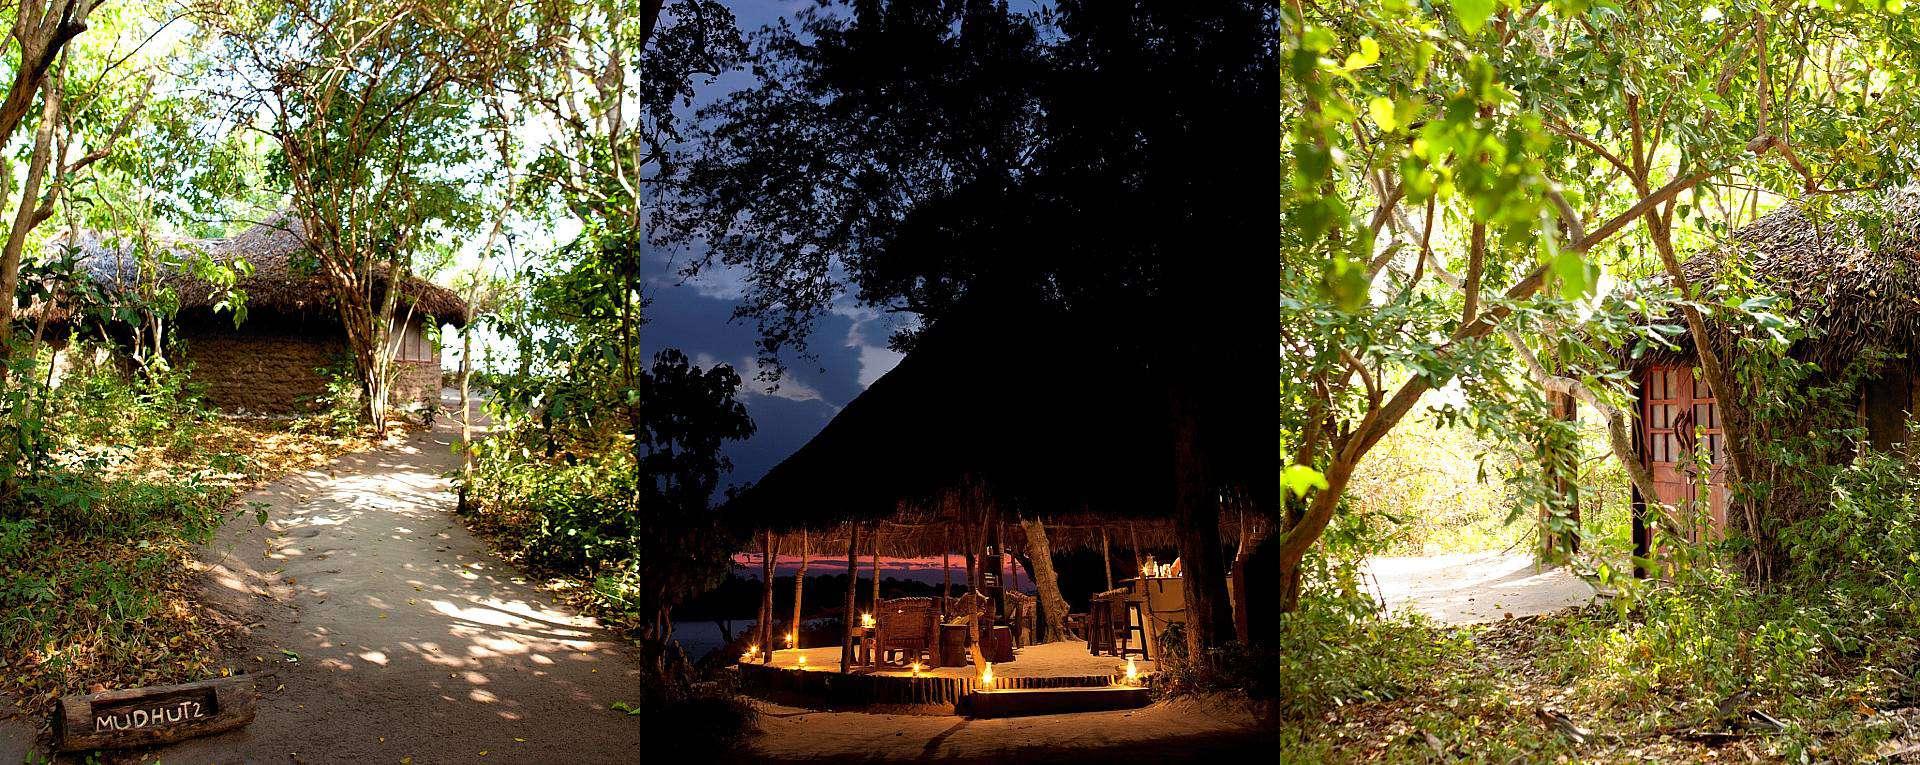 Selous River Camp, Selous - Tanzania - AfricanMecca Safaris